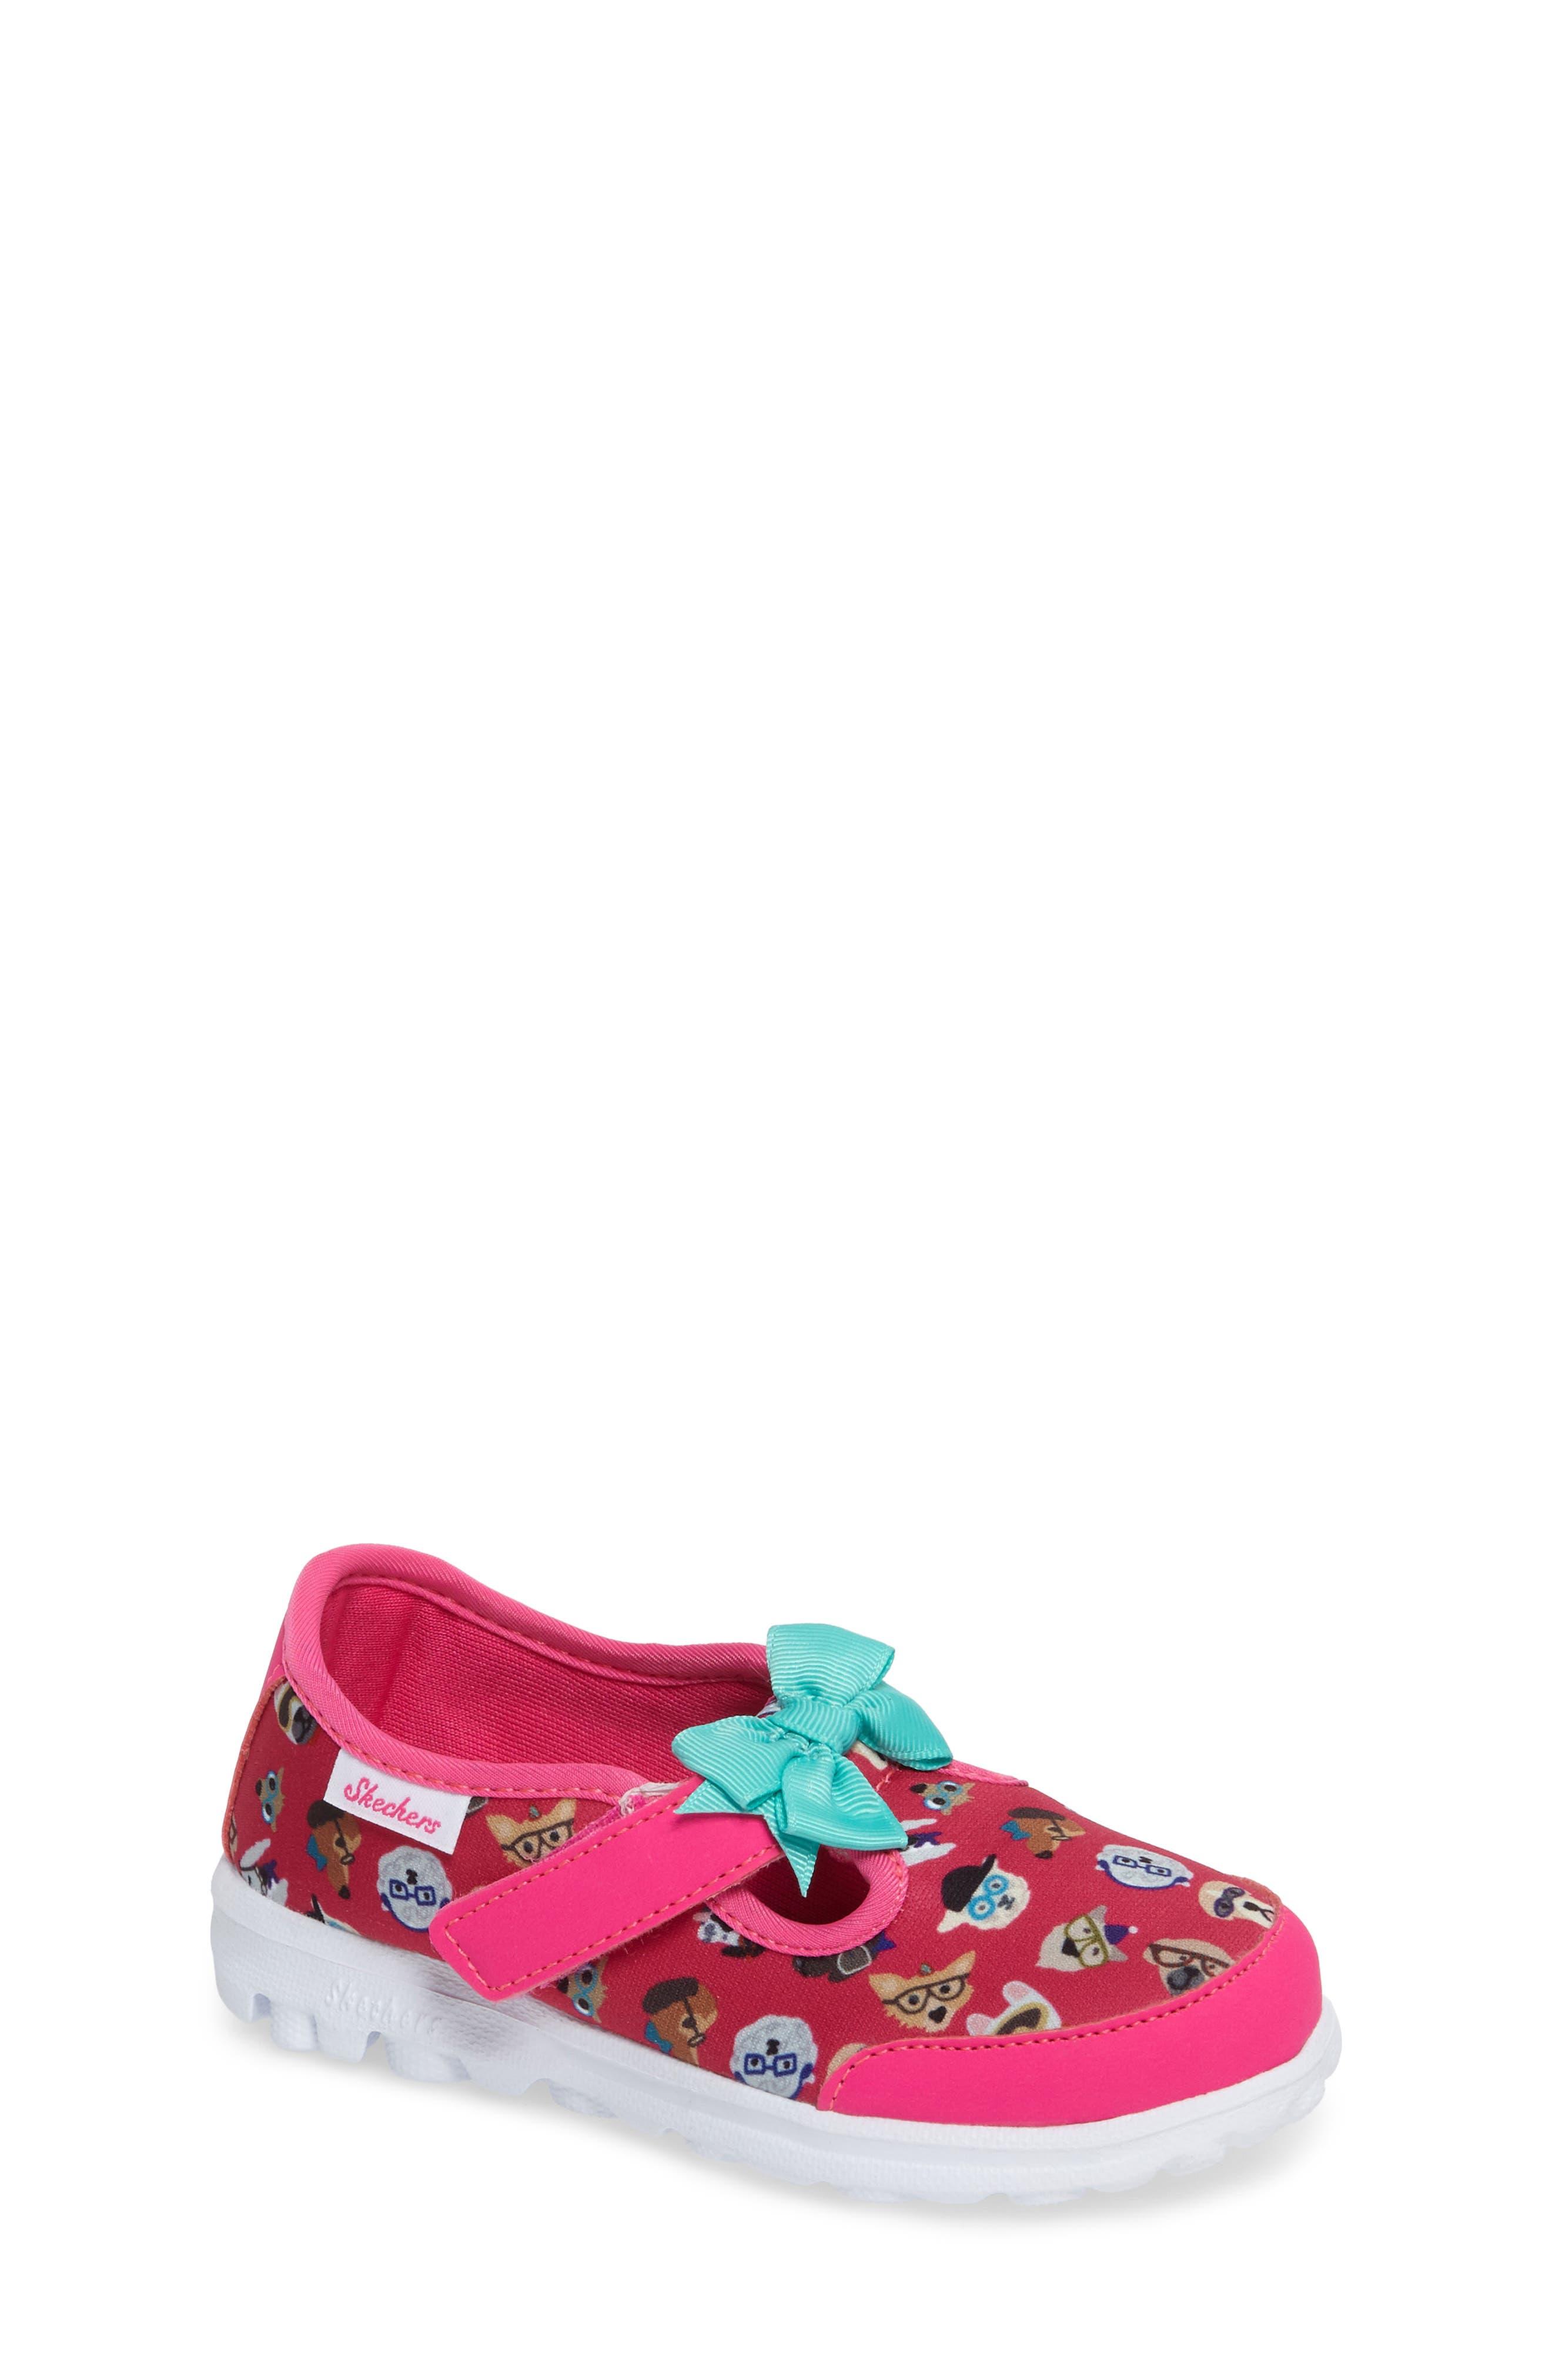 Main Image - SKECHERS Go Walk Bow Wow Sneaker (Baby, Walker & Toddler)